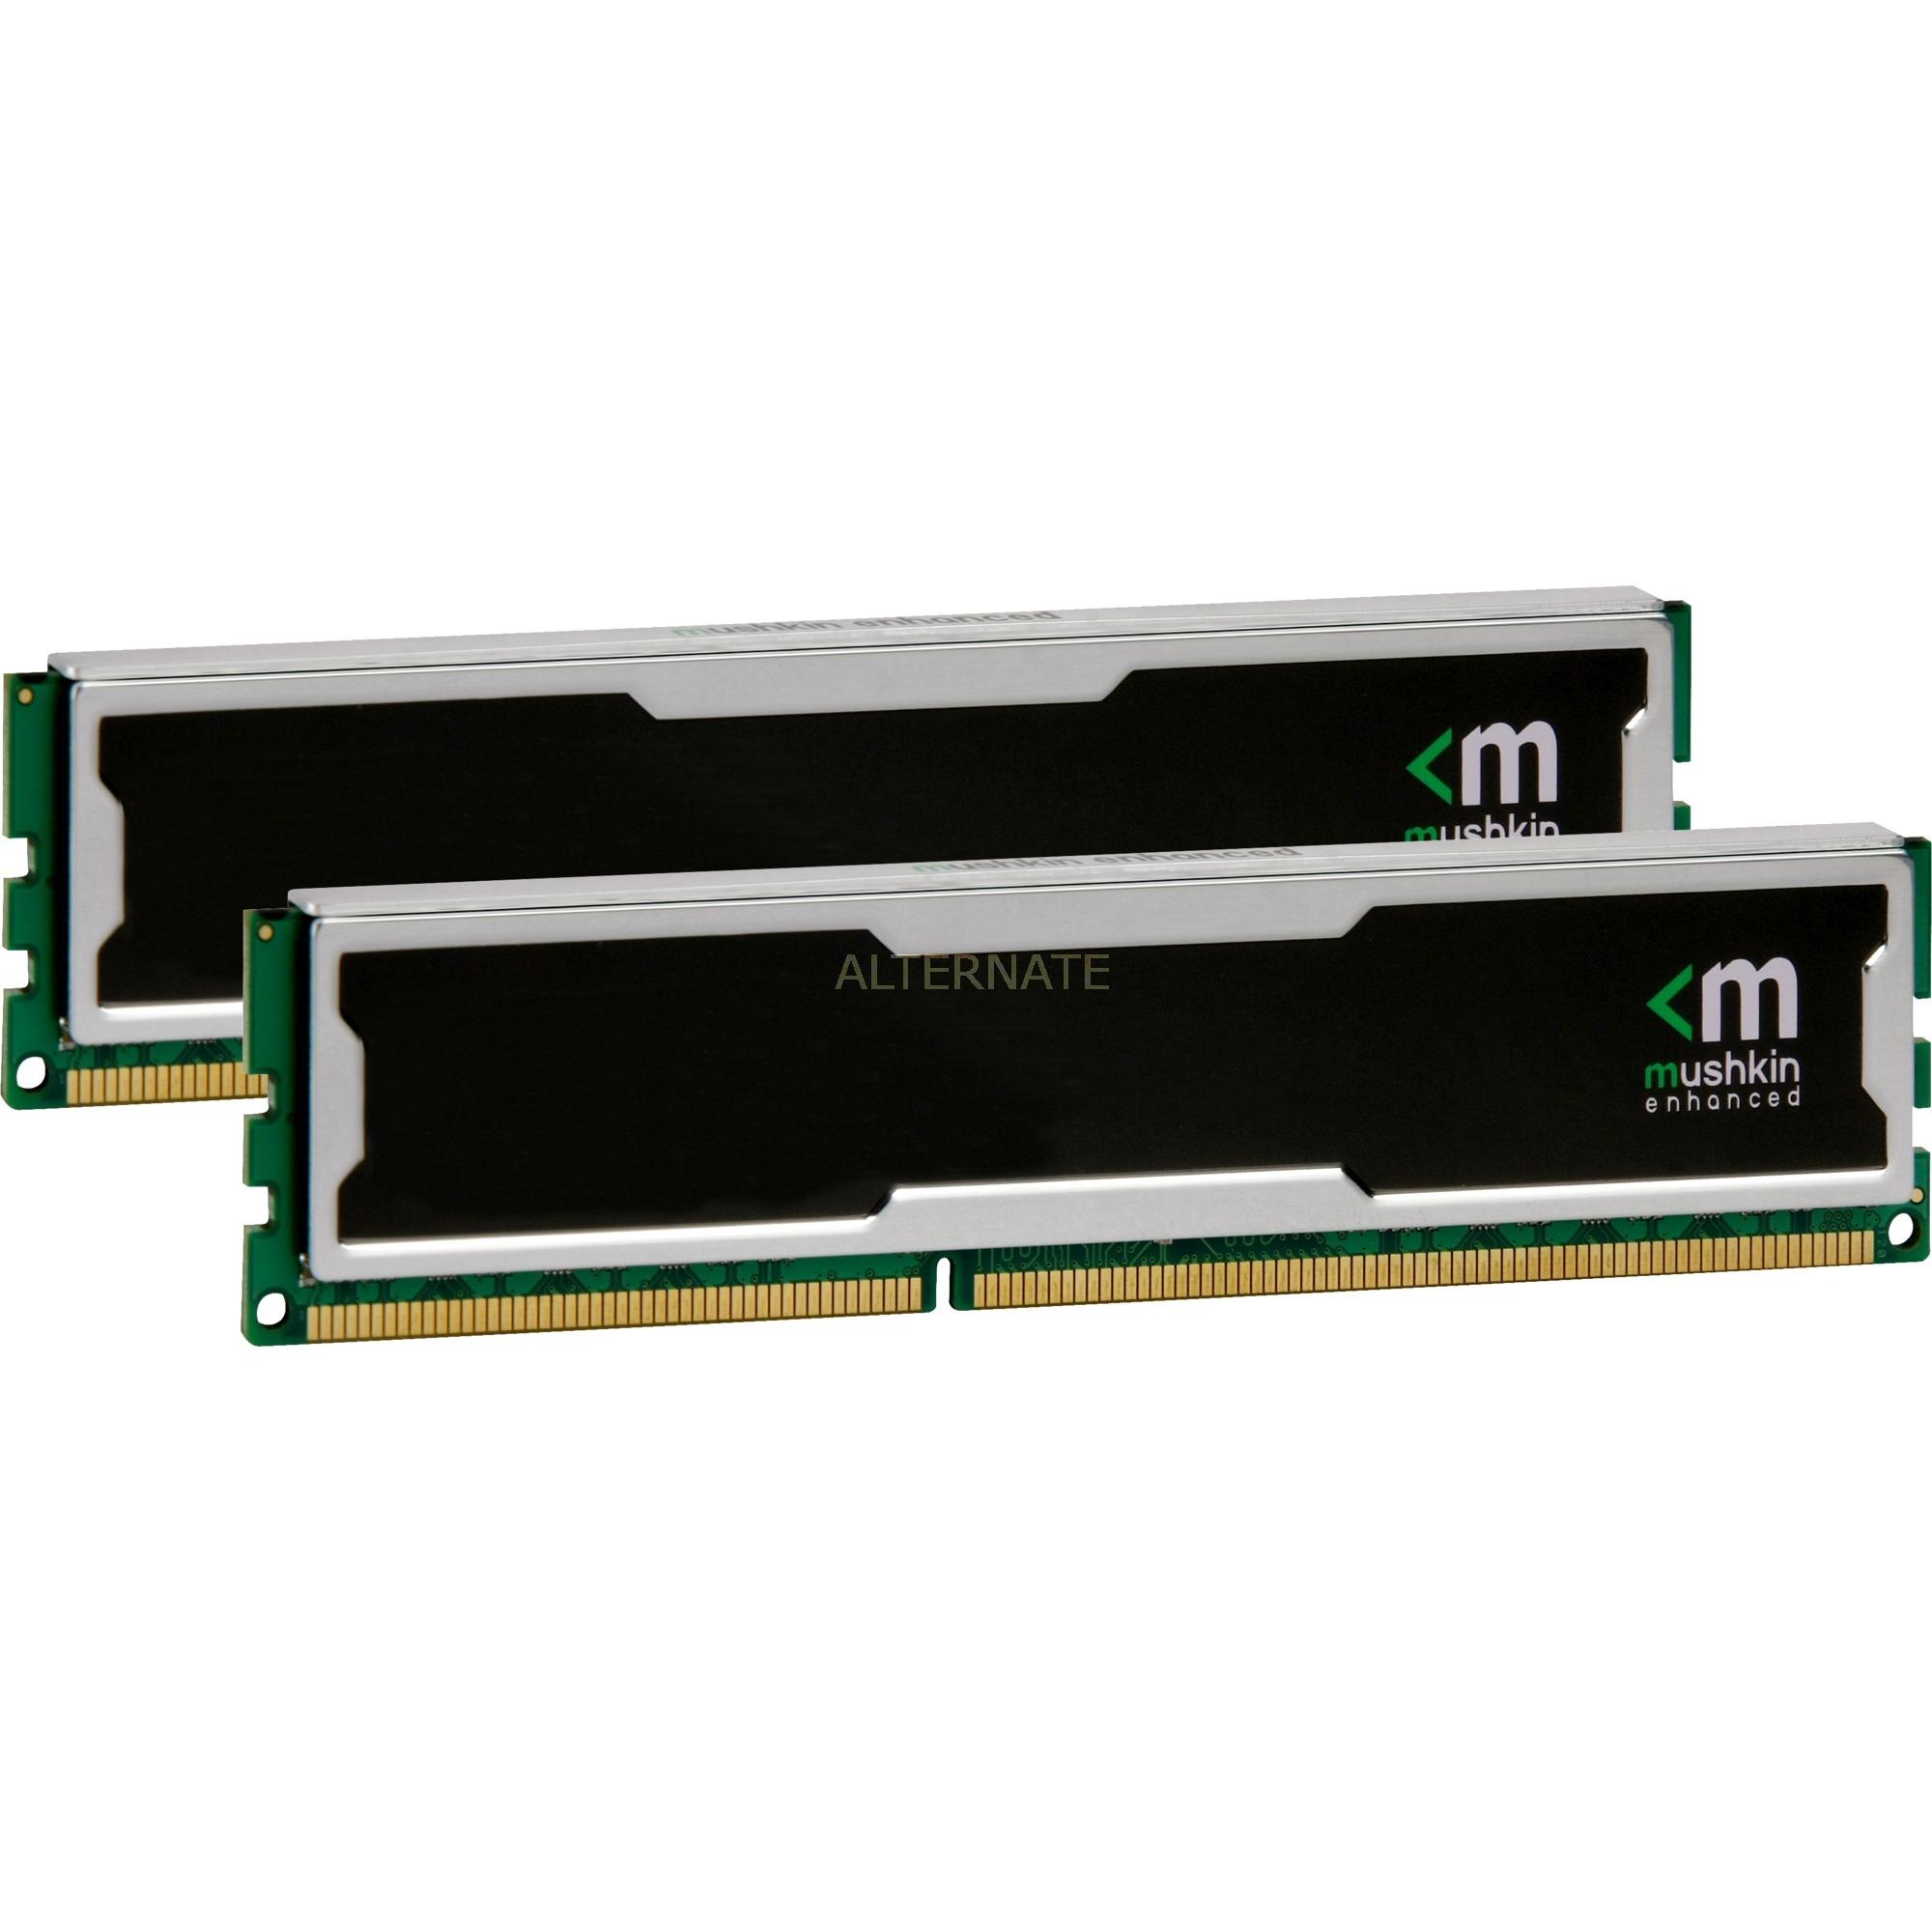 2GB PC3200 módulo de memoria DDR 400 MHz, Memoria RAM